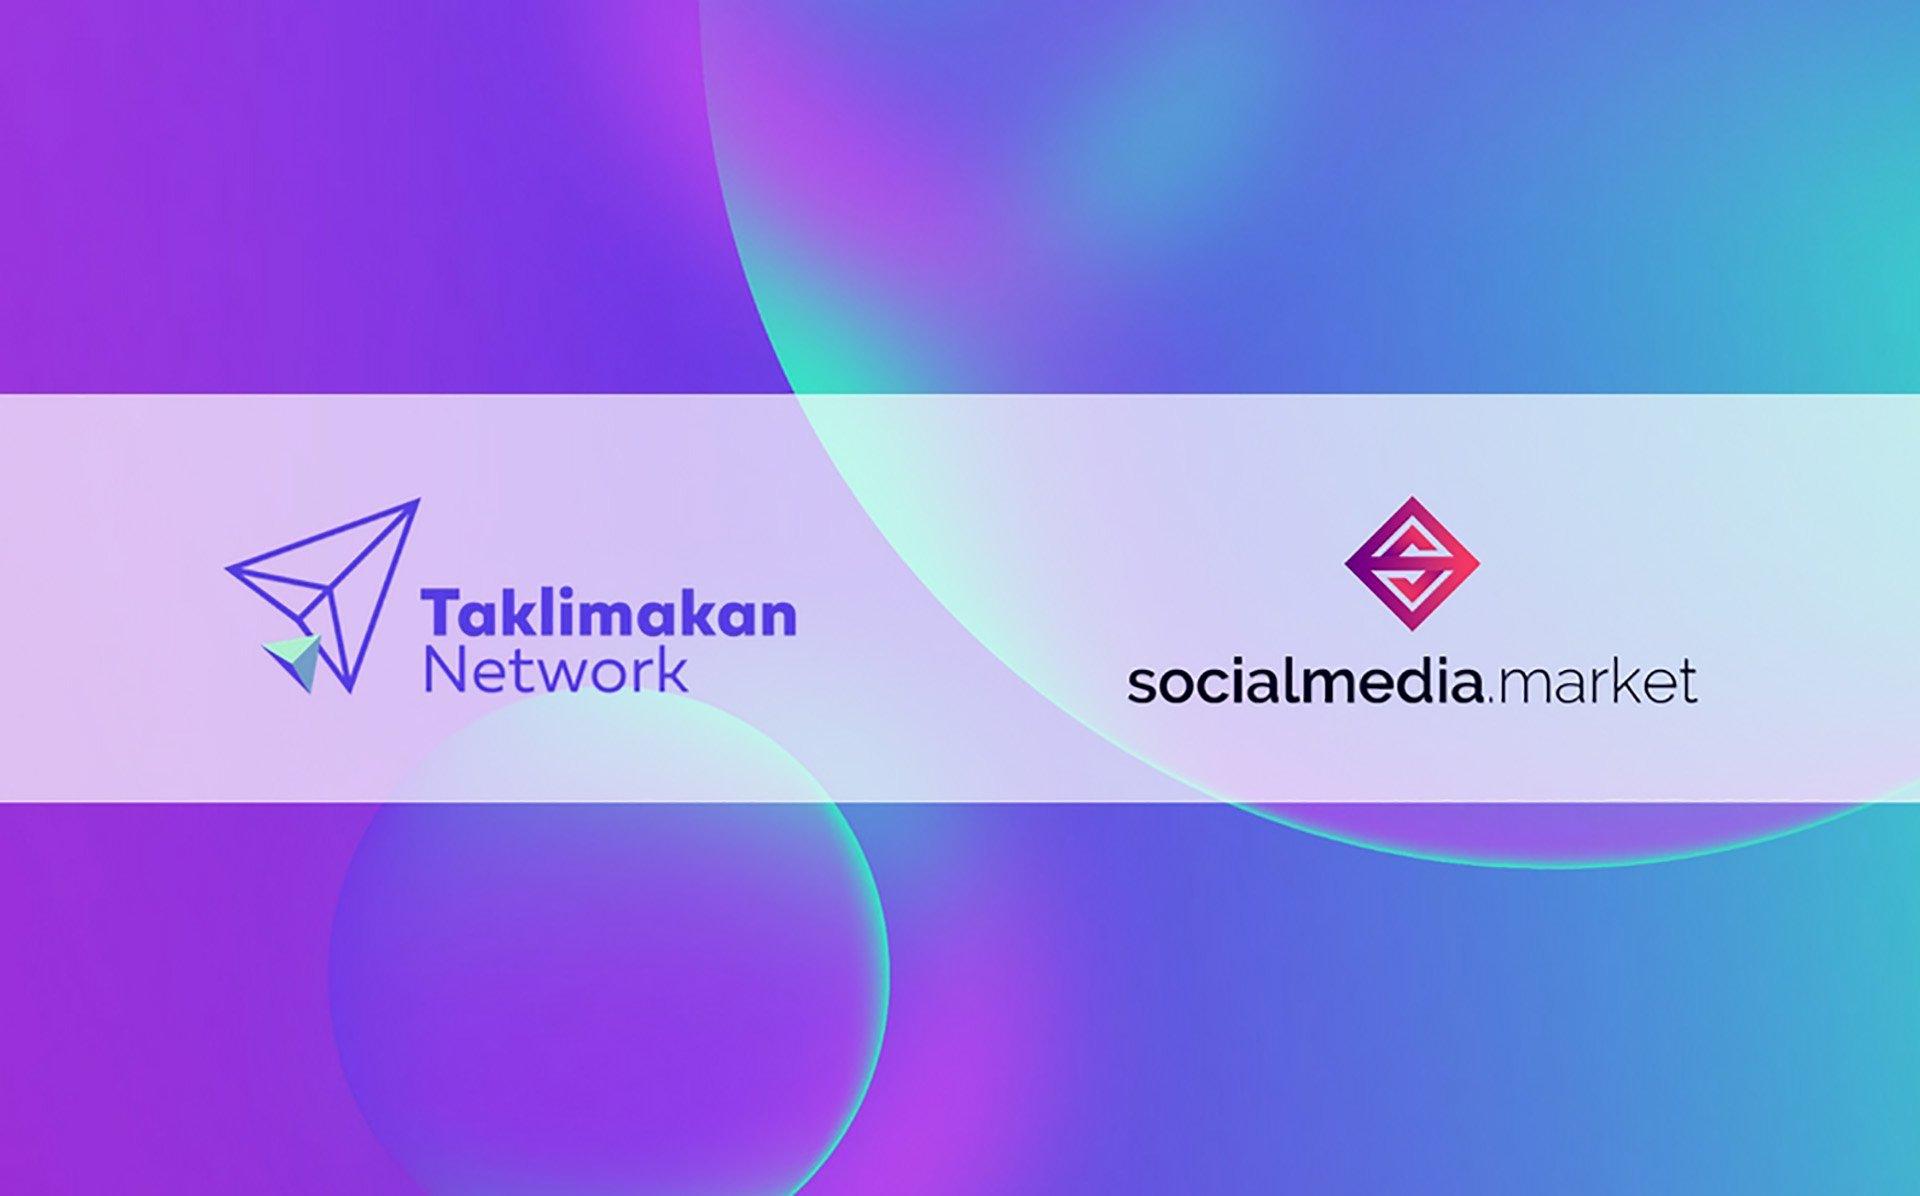 Taklimakan Network and SocialMedia.Market Form Partnership